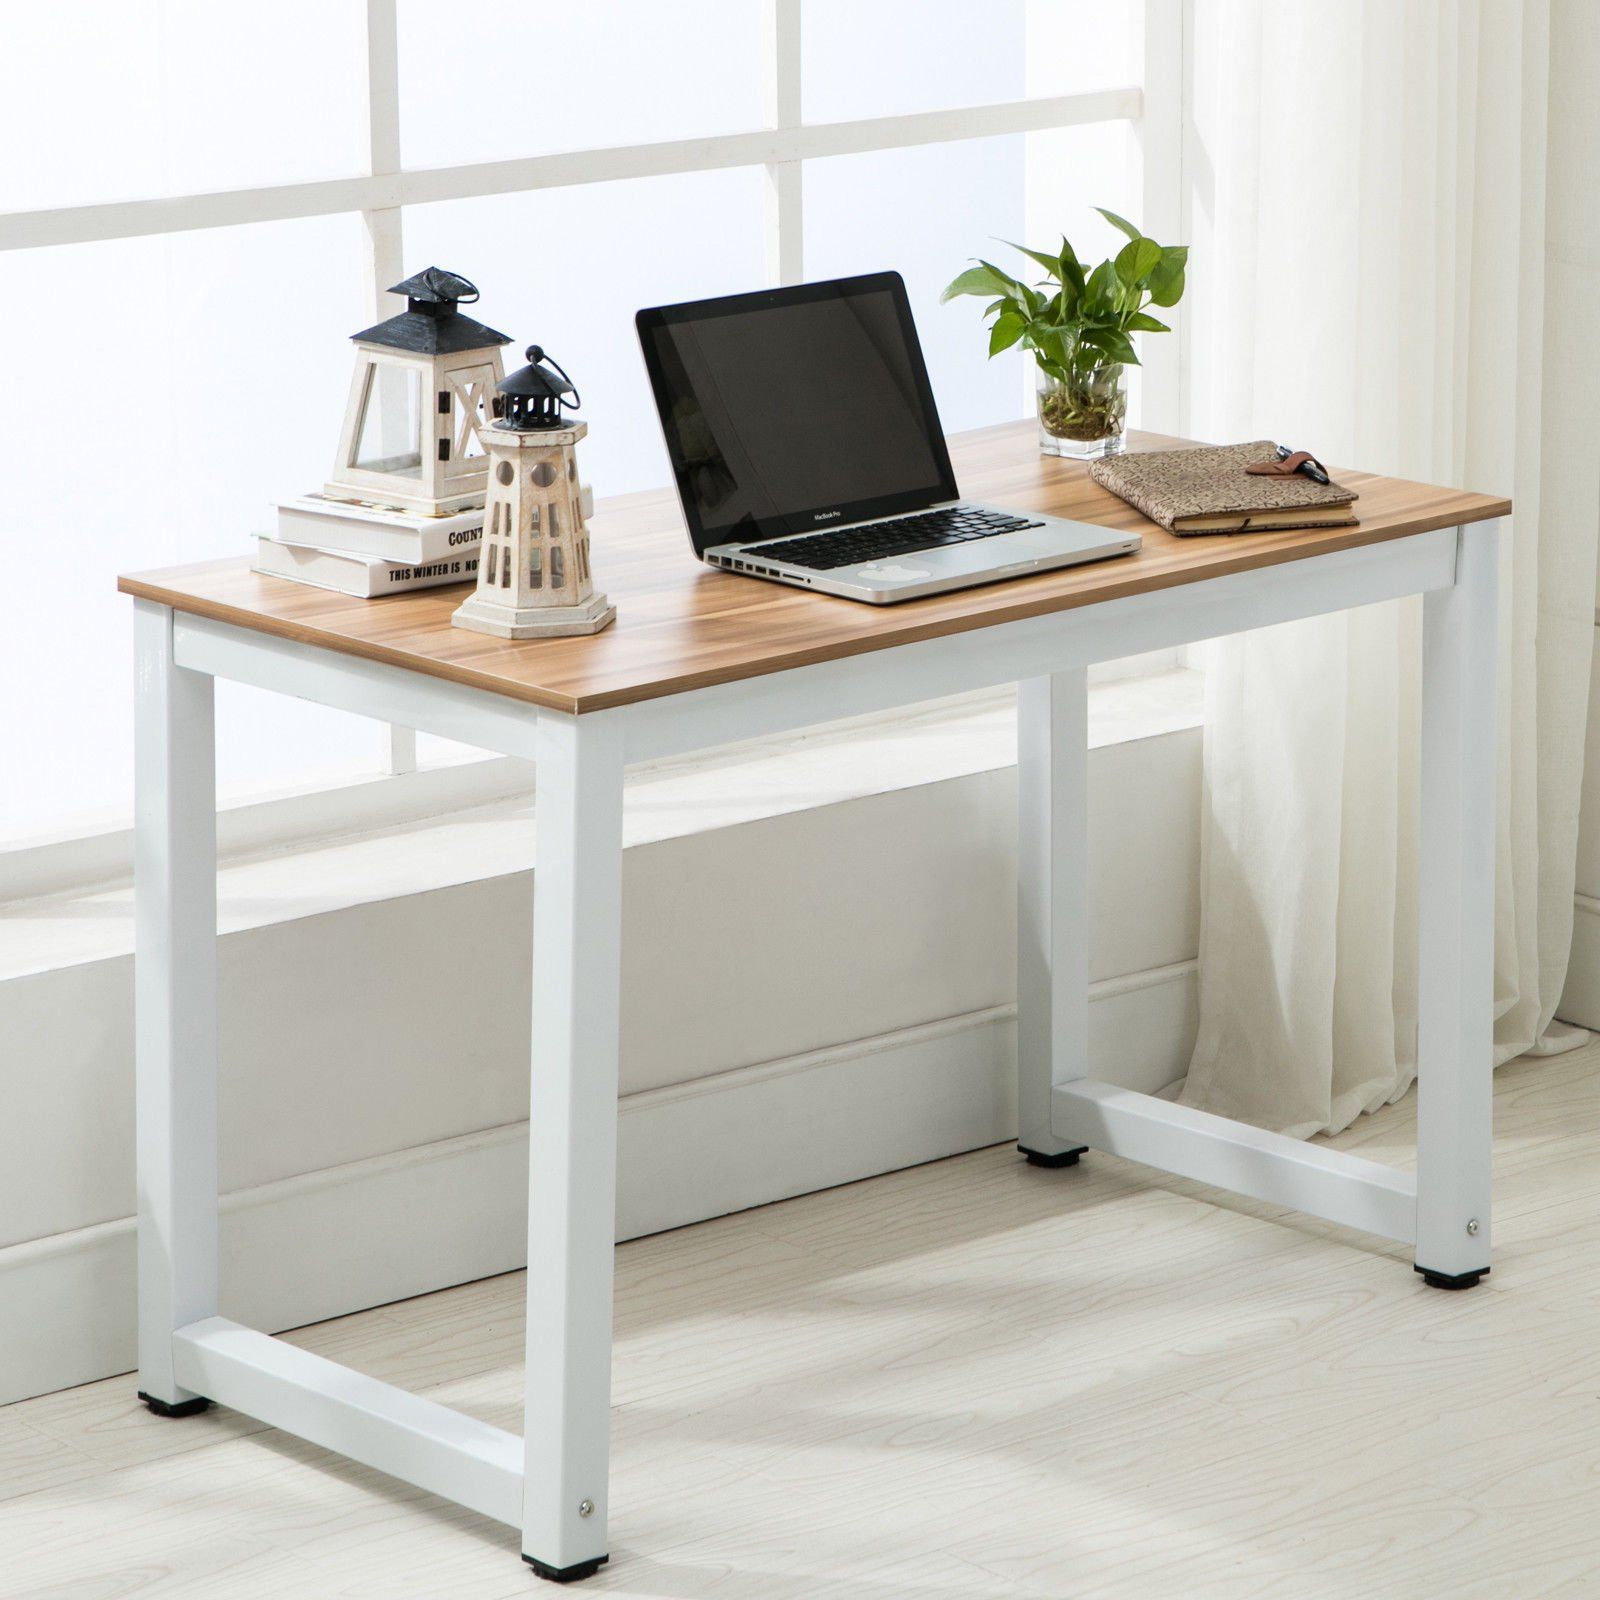 Ktaxon Wood Computer Desk Pc Laptop Study Table Workstation Home Office Furniture Walmart Com In 2020 Wood Computer Desk Home Office Furniture Pc Desk